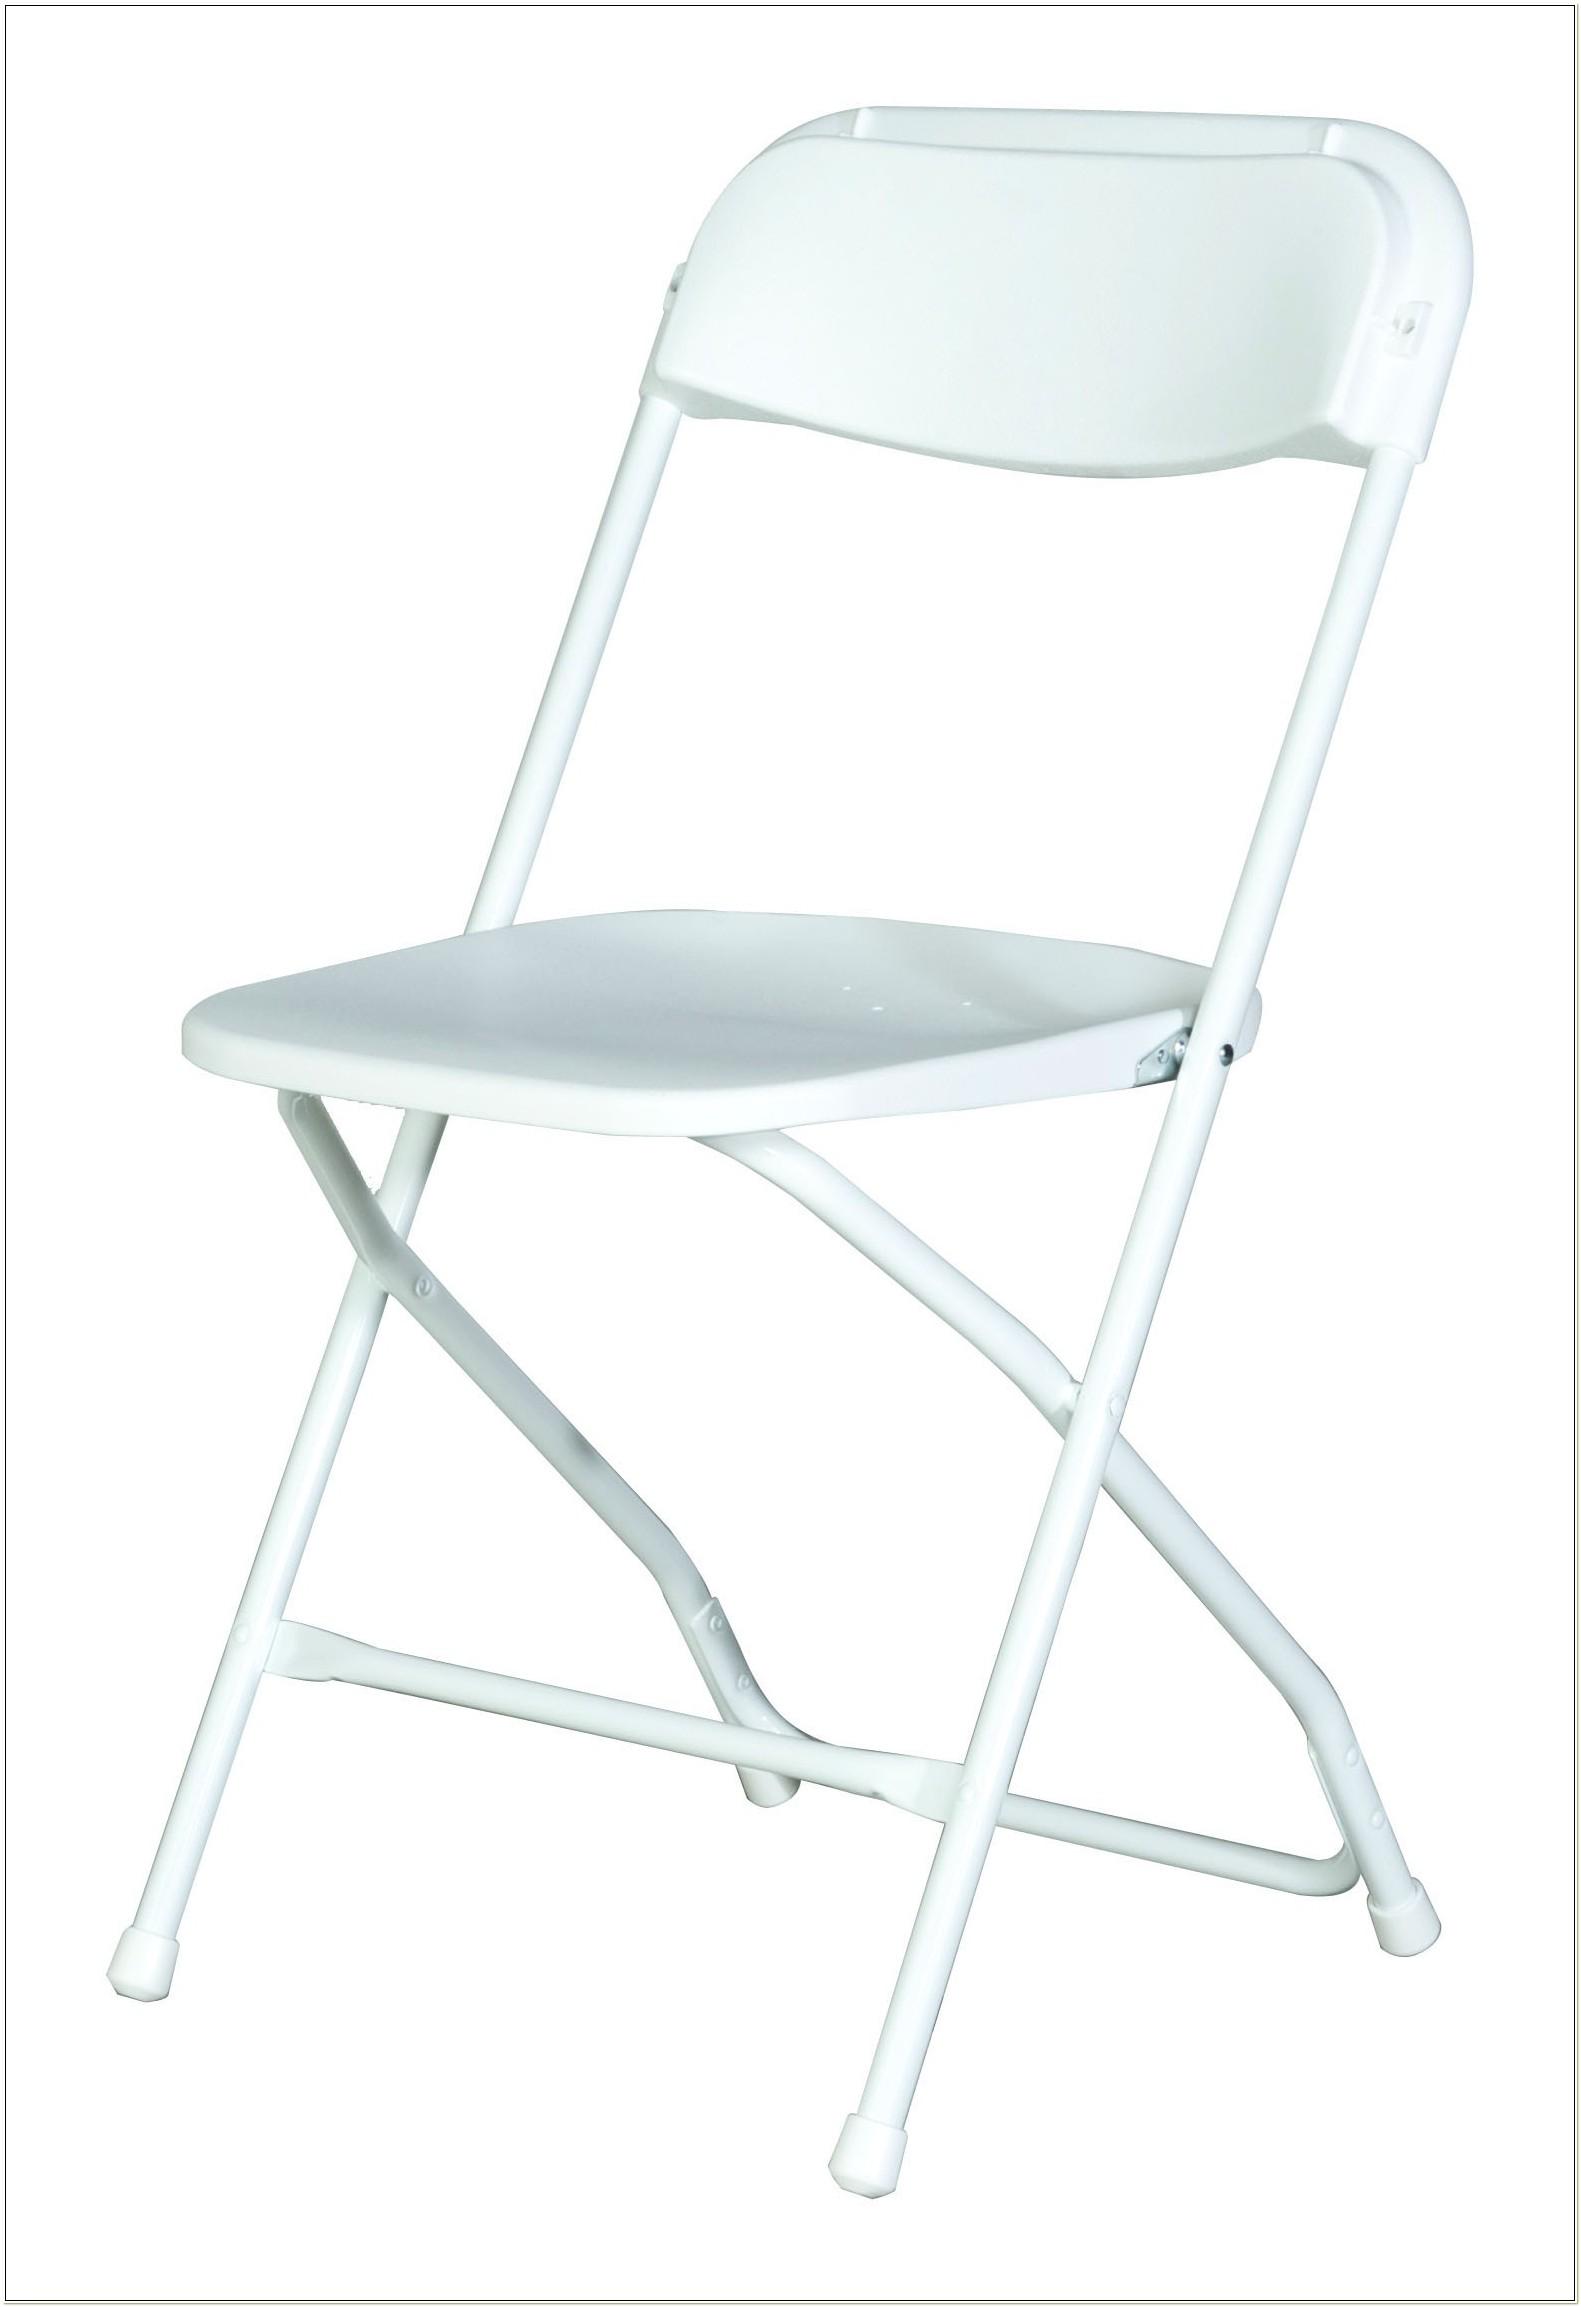 Samsonite White Plastic Folding Chairs